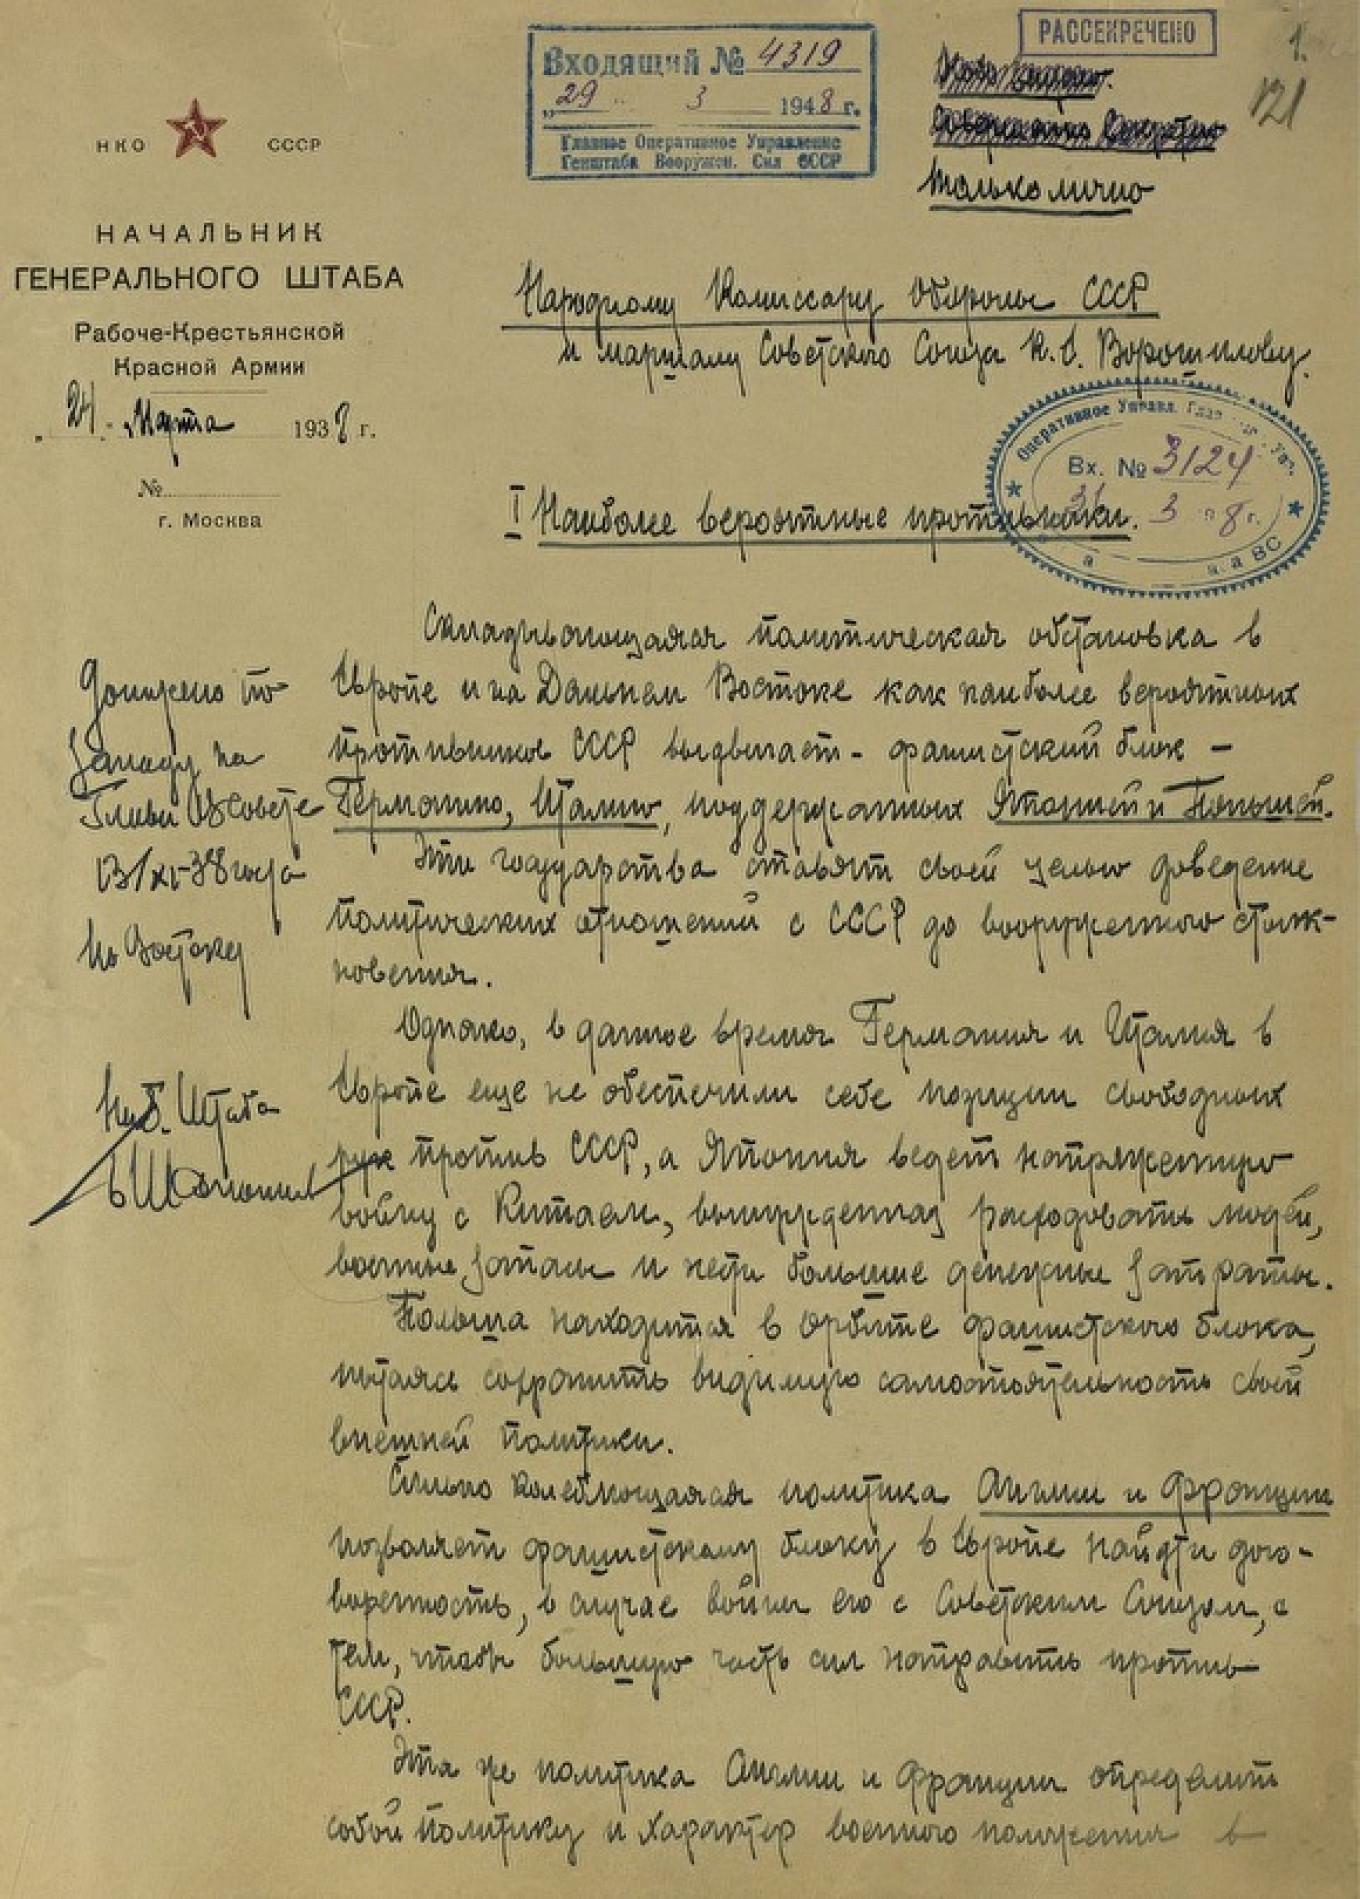 Рakt1939.mil.ru